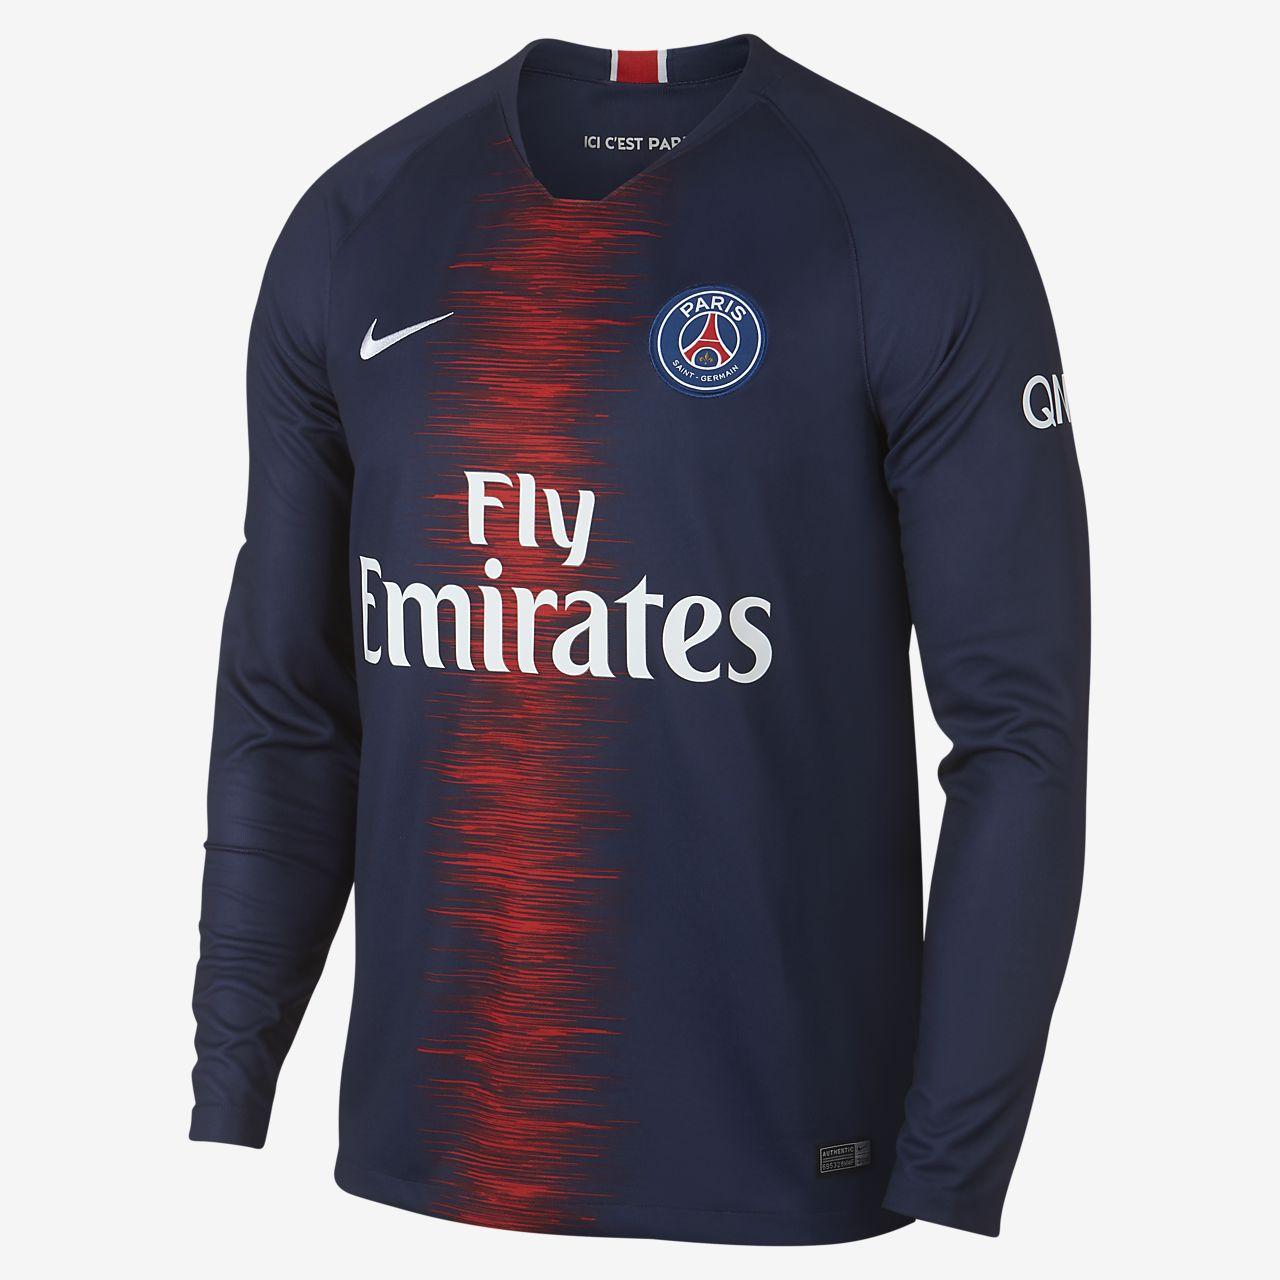 2018 19 paris saint germain stadium home uzun kollu erkek futbol formas tr. Black Bedroom Furniture Sets. Home Design Ideas